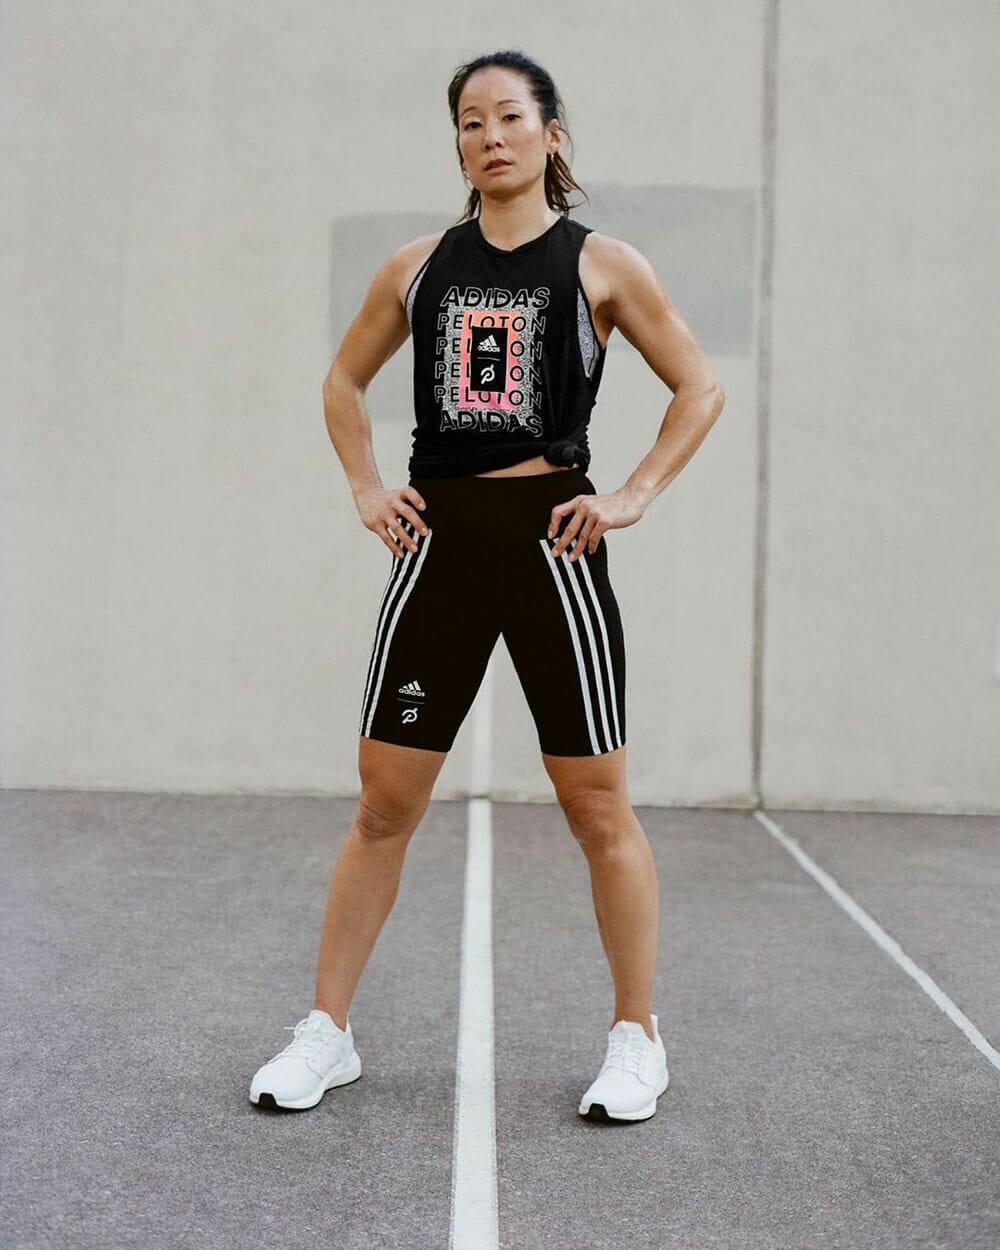 Adidas cheap workout clothes